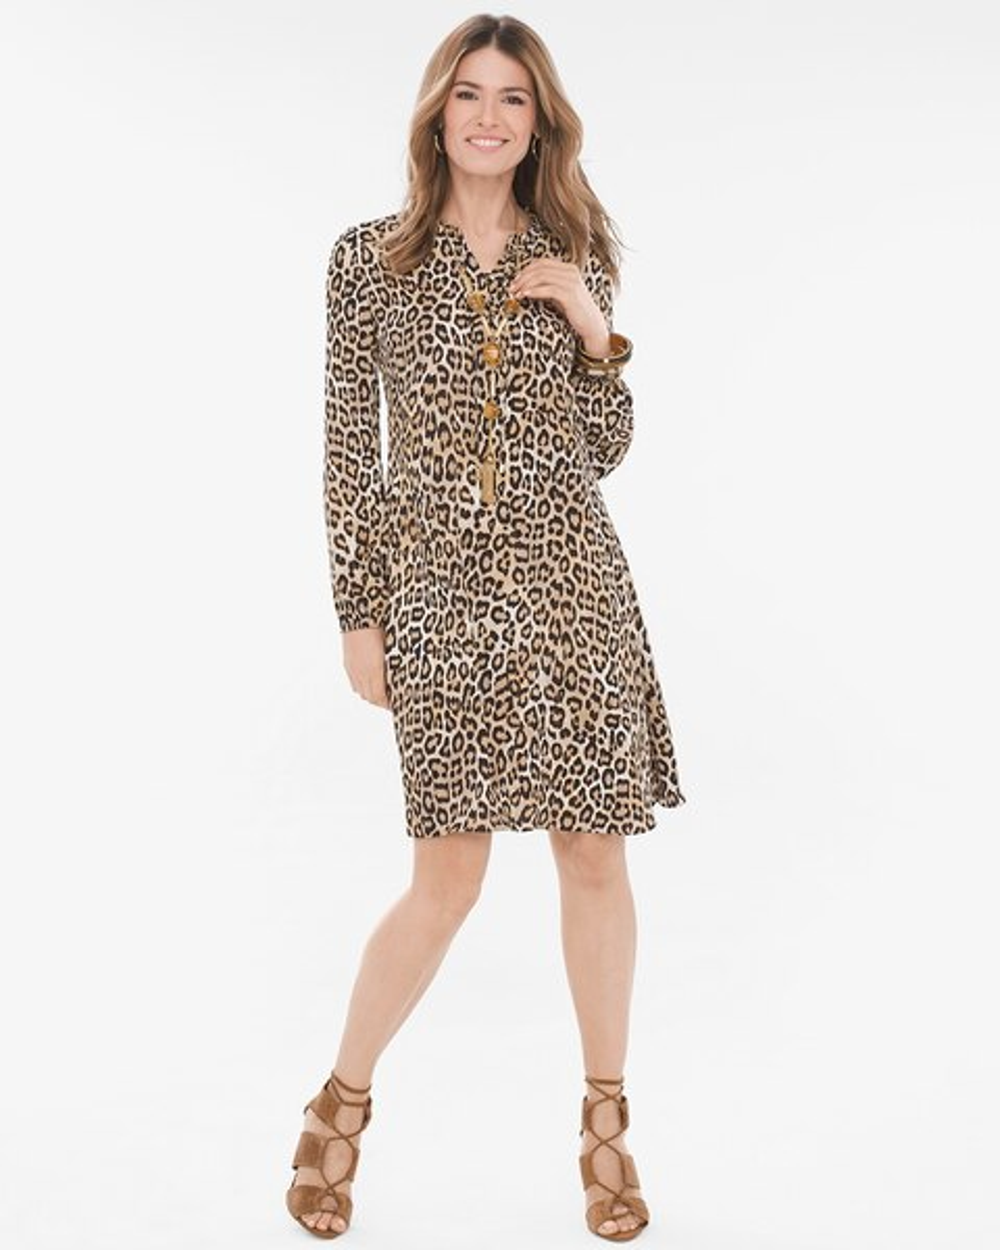 eb8548b276 Leopard-Print Dress - Chico s